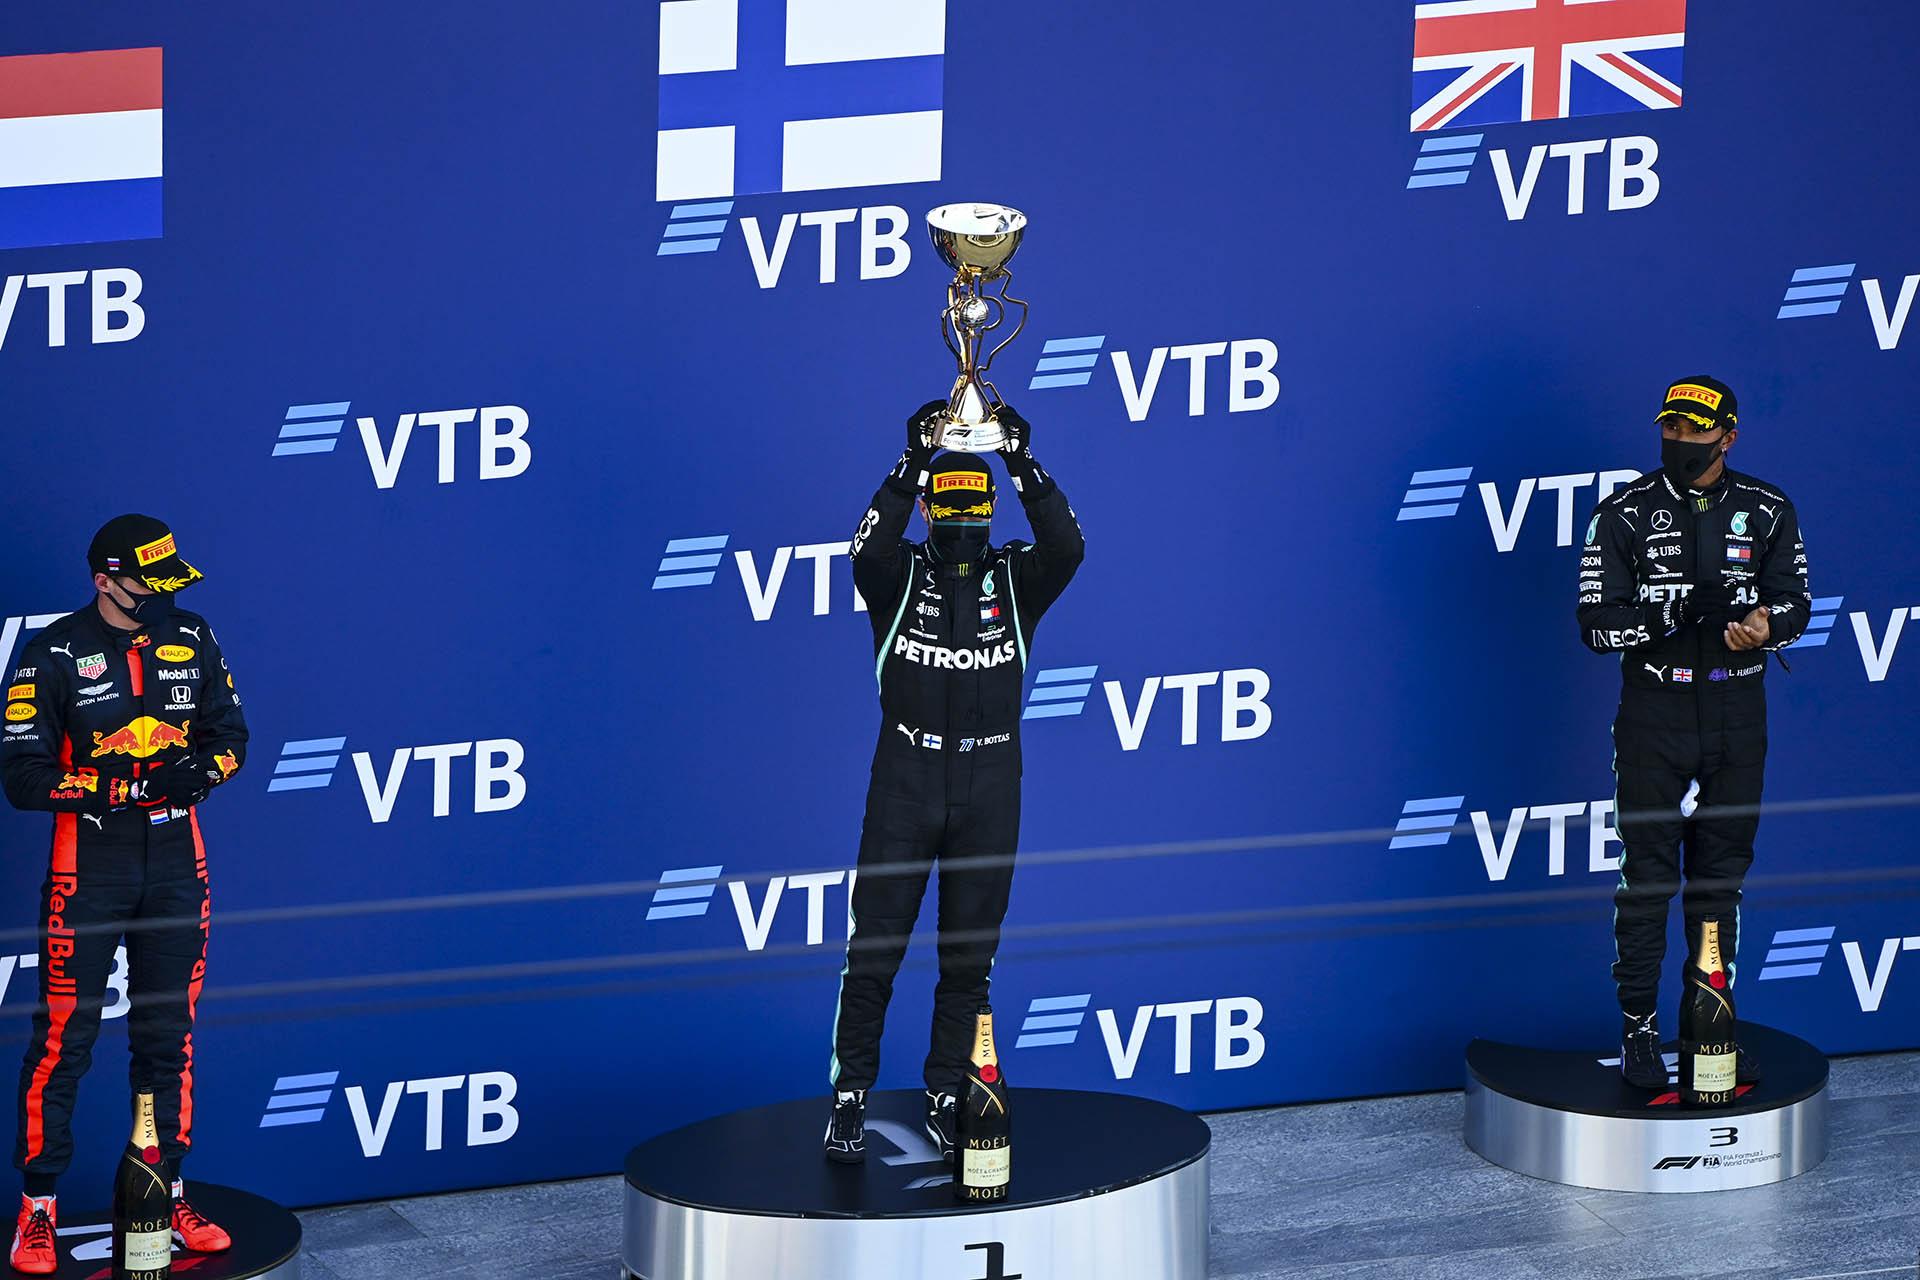 2020 Russian GP